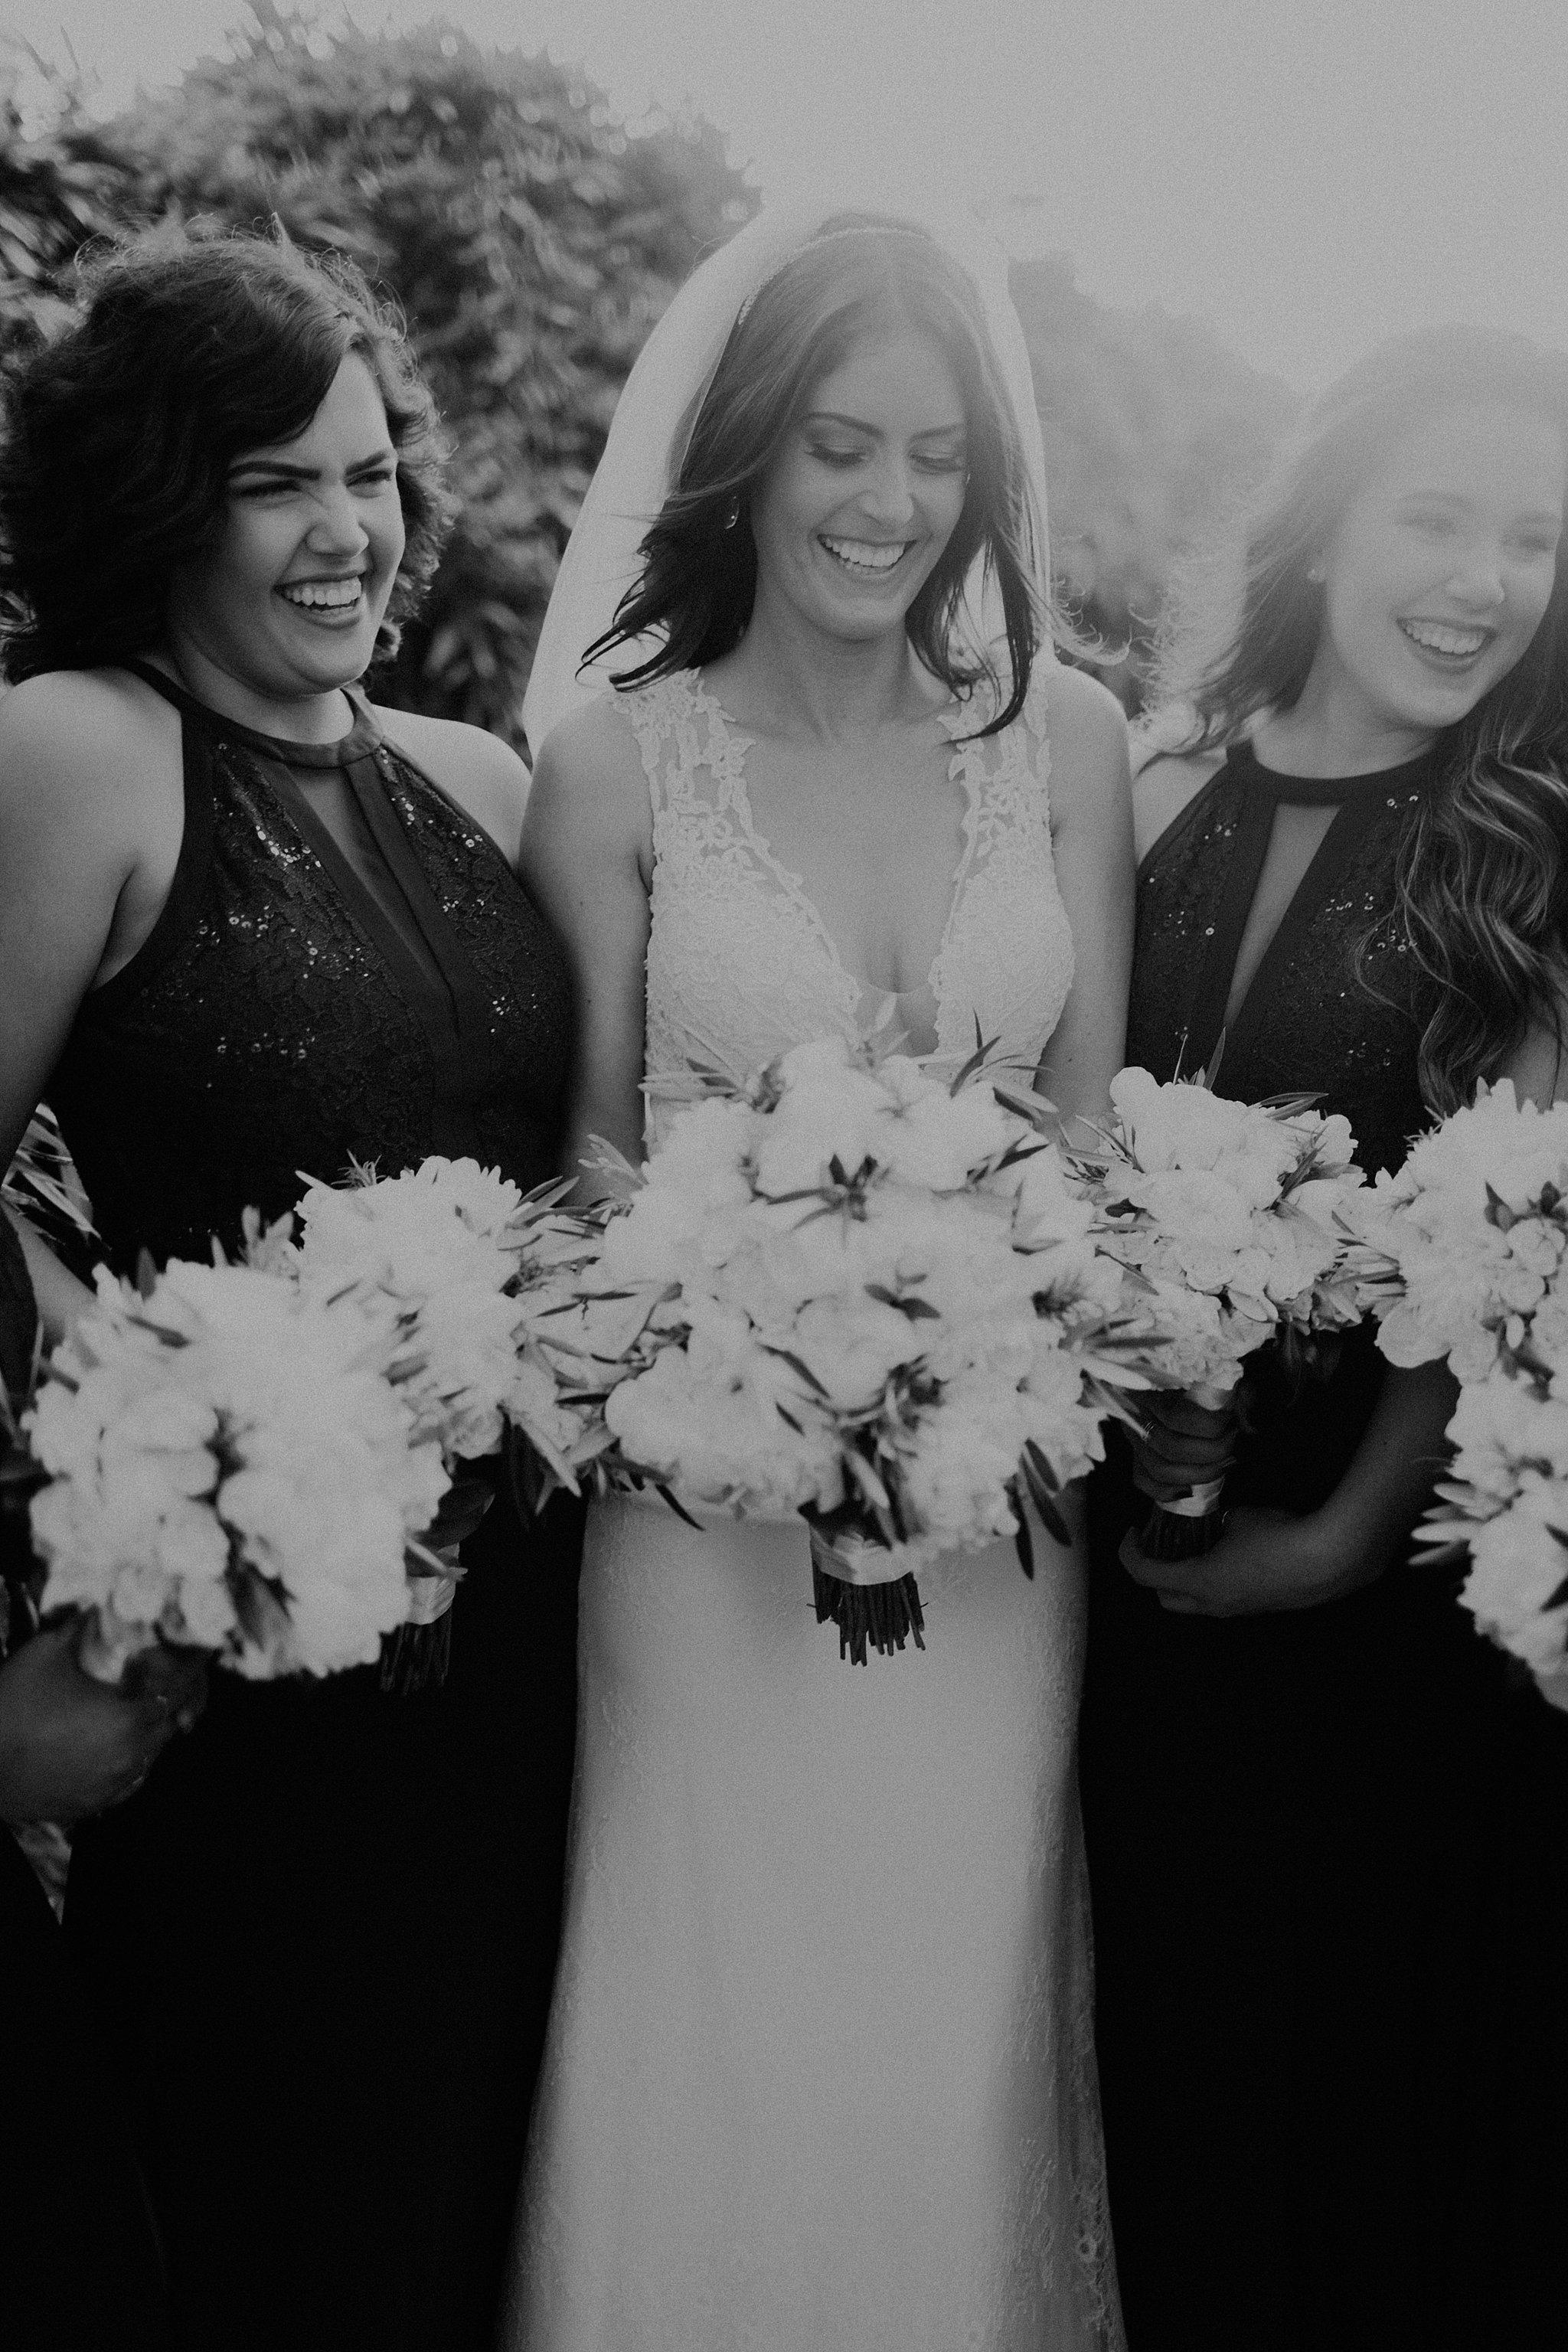 samantha_mcfarlen_bellingham_washington_engagement_photography_seattle_wedding_photographer_0227.jpg